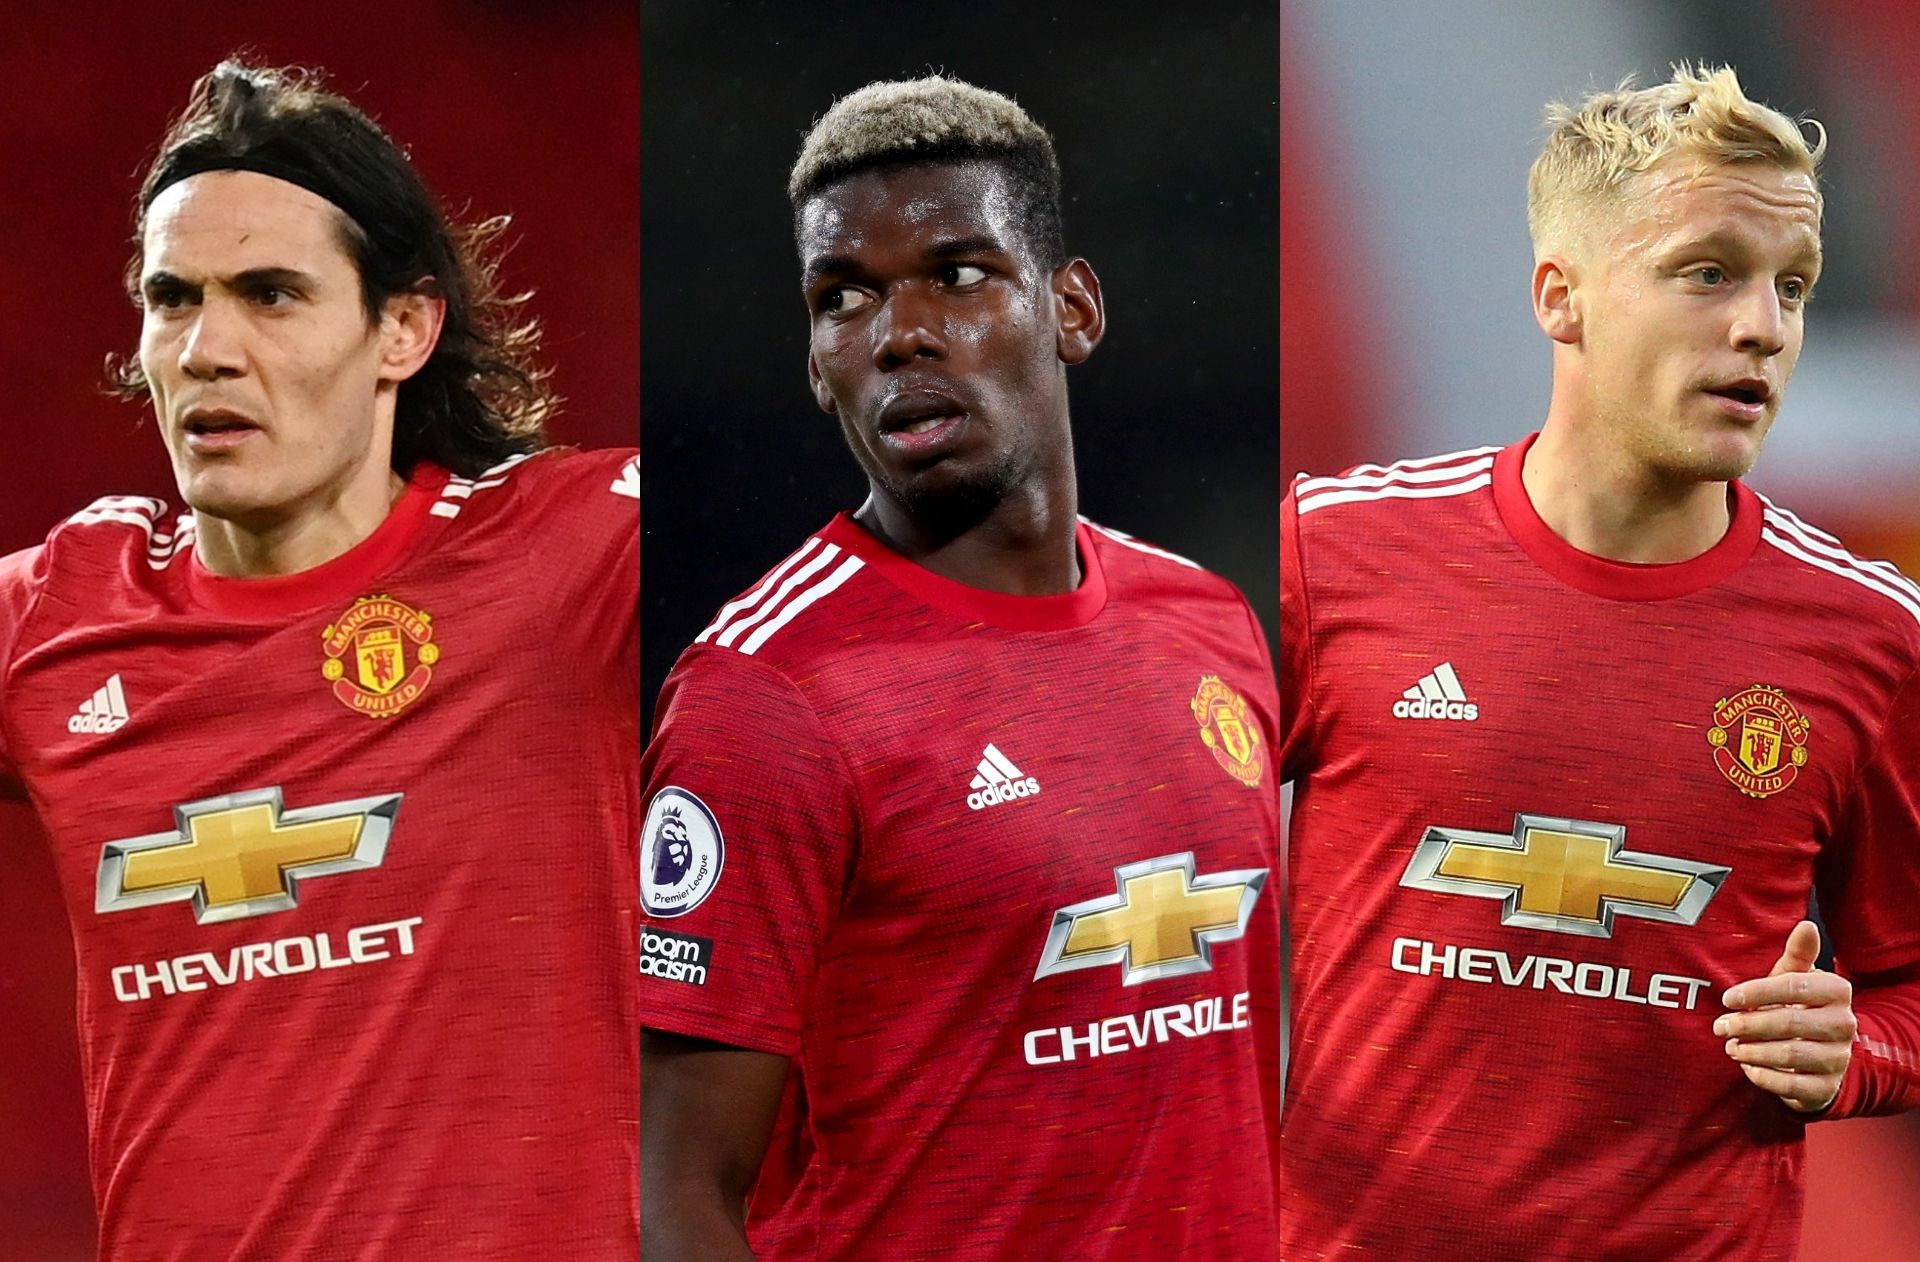 Edinson Cavani, Paul Pogba, Donny van de Beek - Manchester United